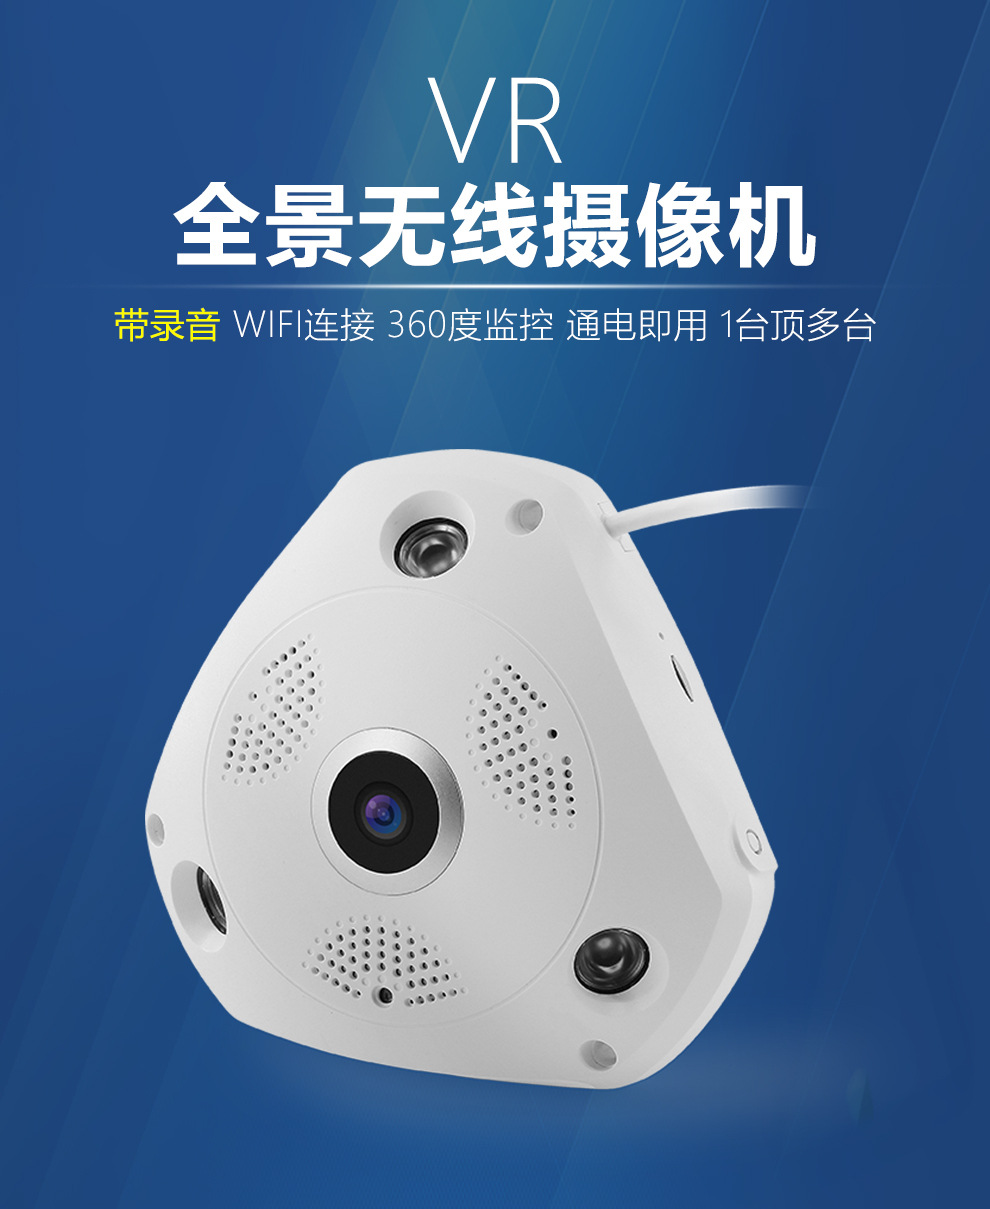 360 Degree Panoramic Camera 3MP Fisheye Panoramic IP Camera HD 1080P WIFI PTZ CCTV 3D VR Video IP Camera Cam горелка tbi sb 360 blackesg 3 м